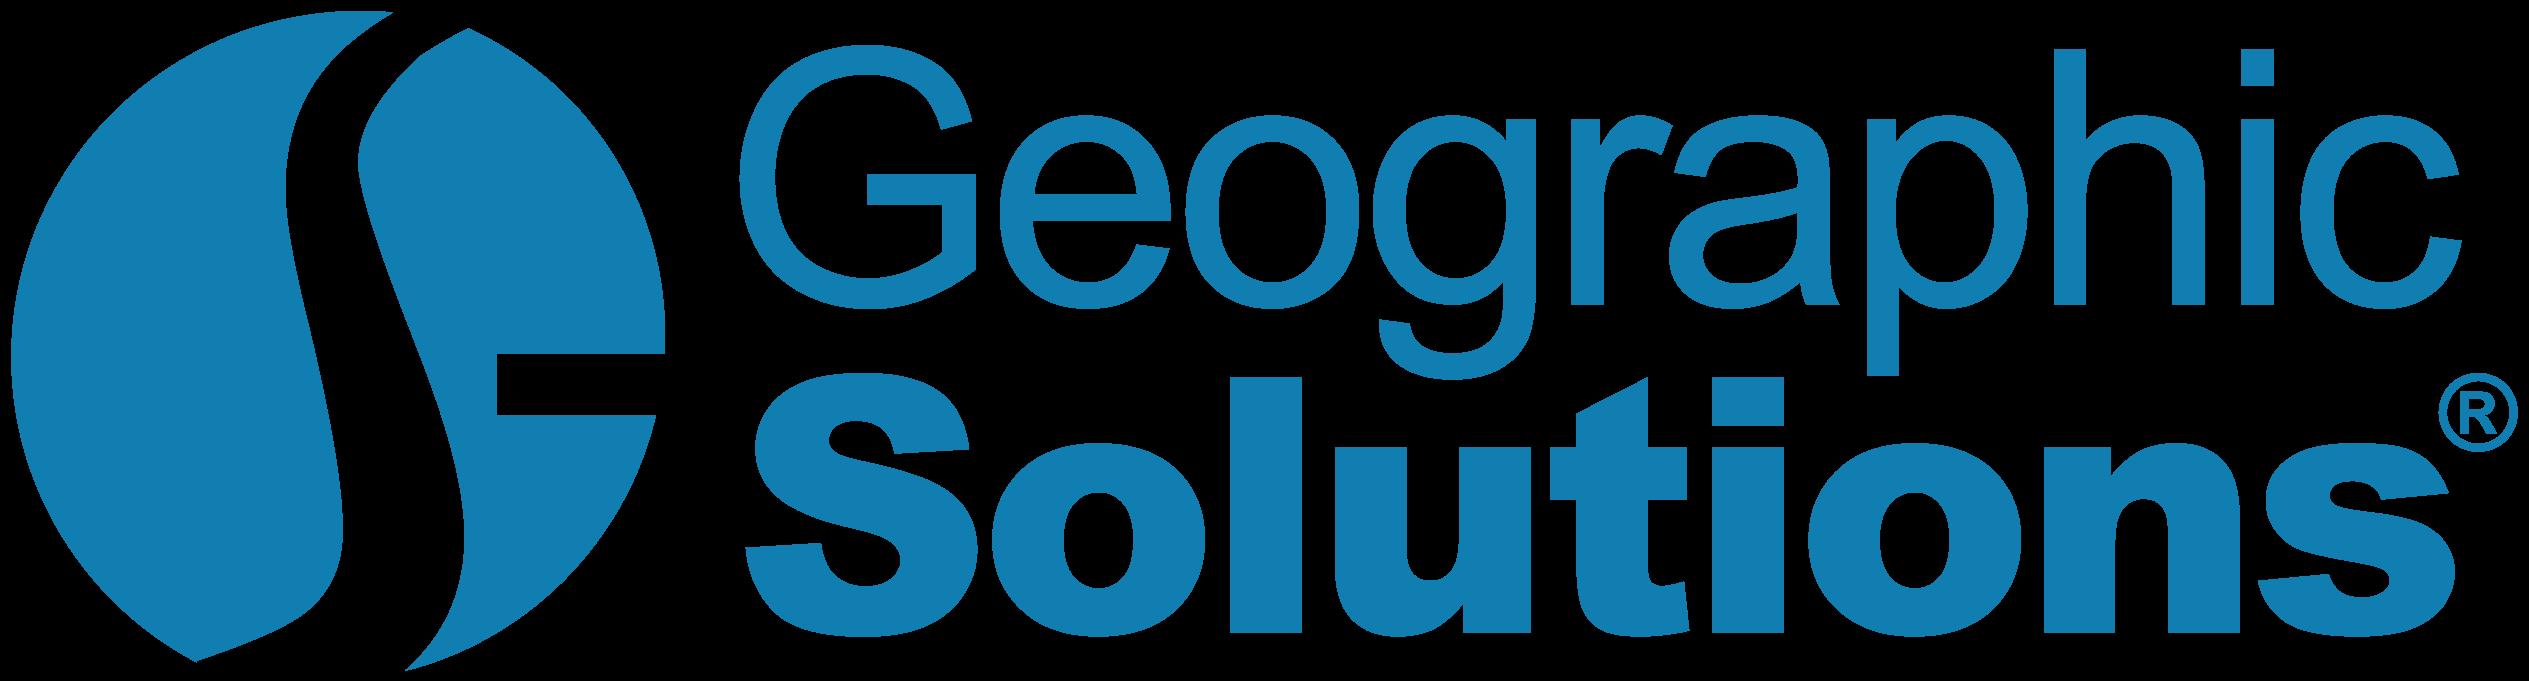 GeoSolutions (Cvent)